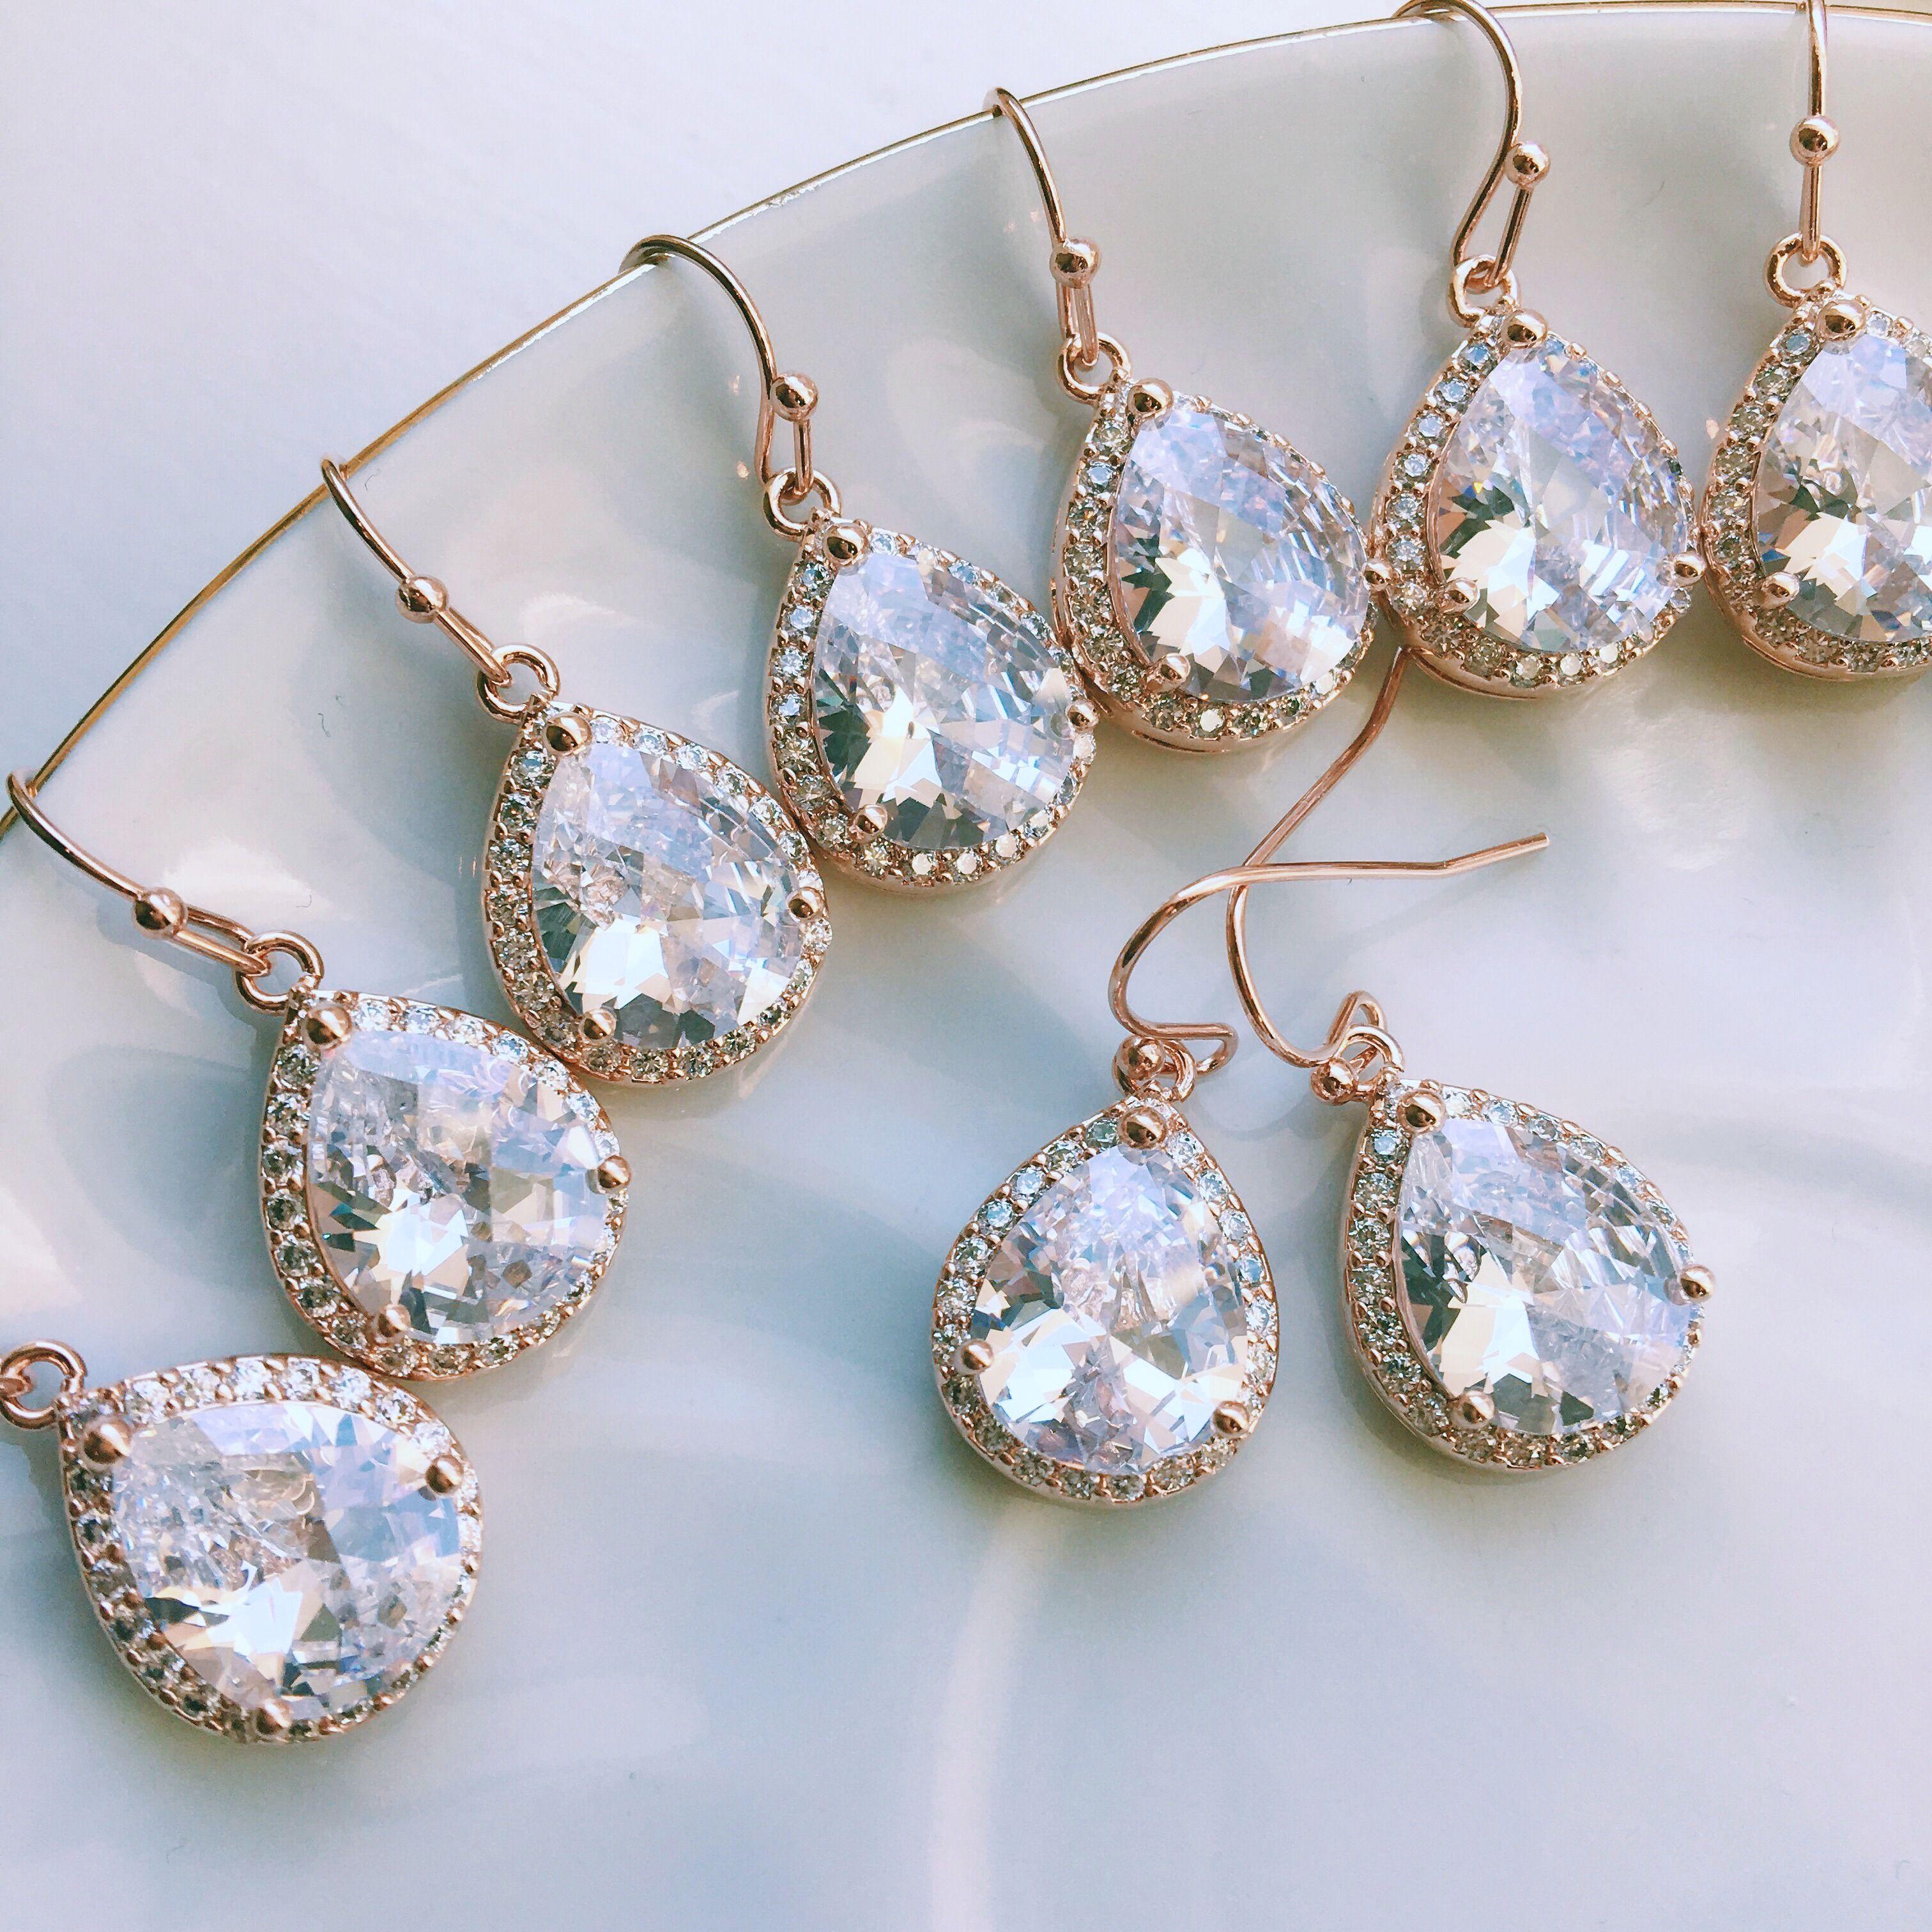 FLASH SALE Crystal Teardrop Earrings Rose Gold, Gold